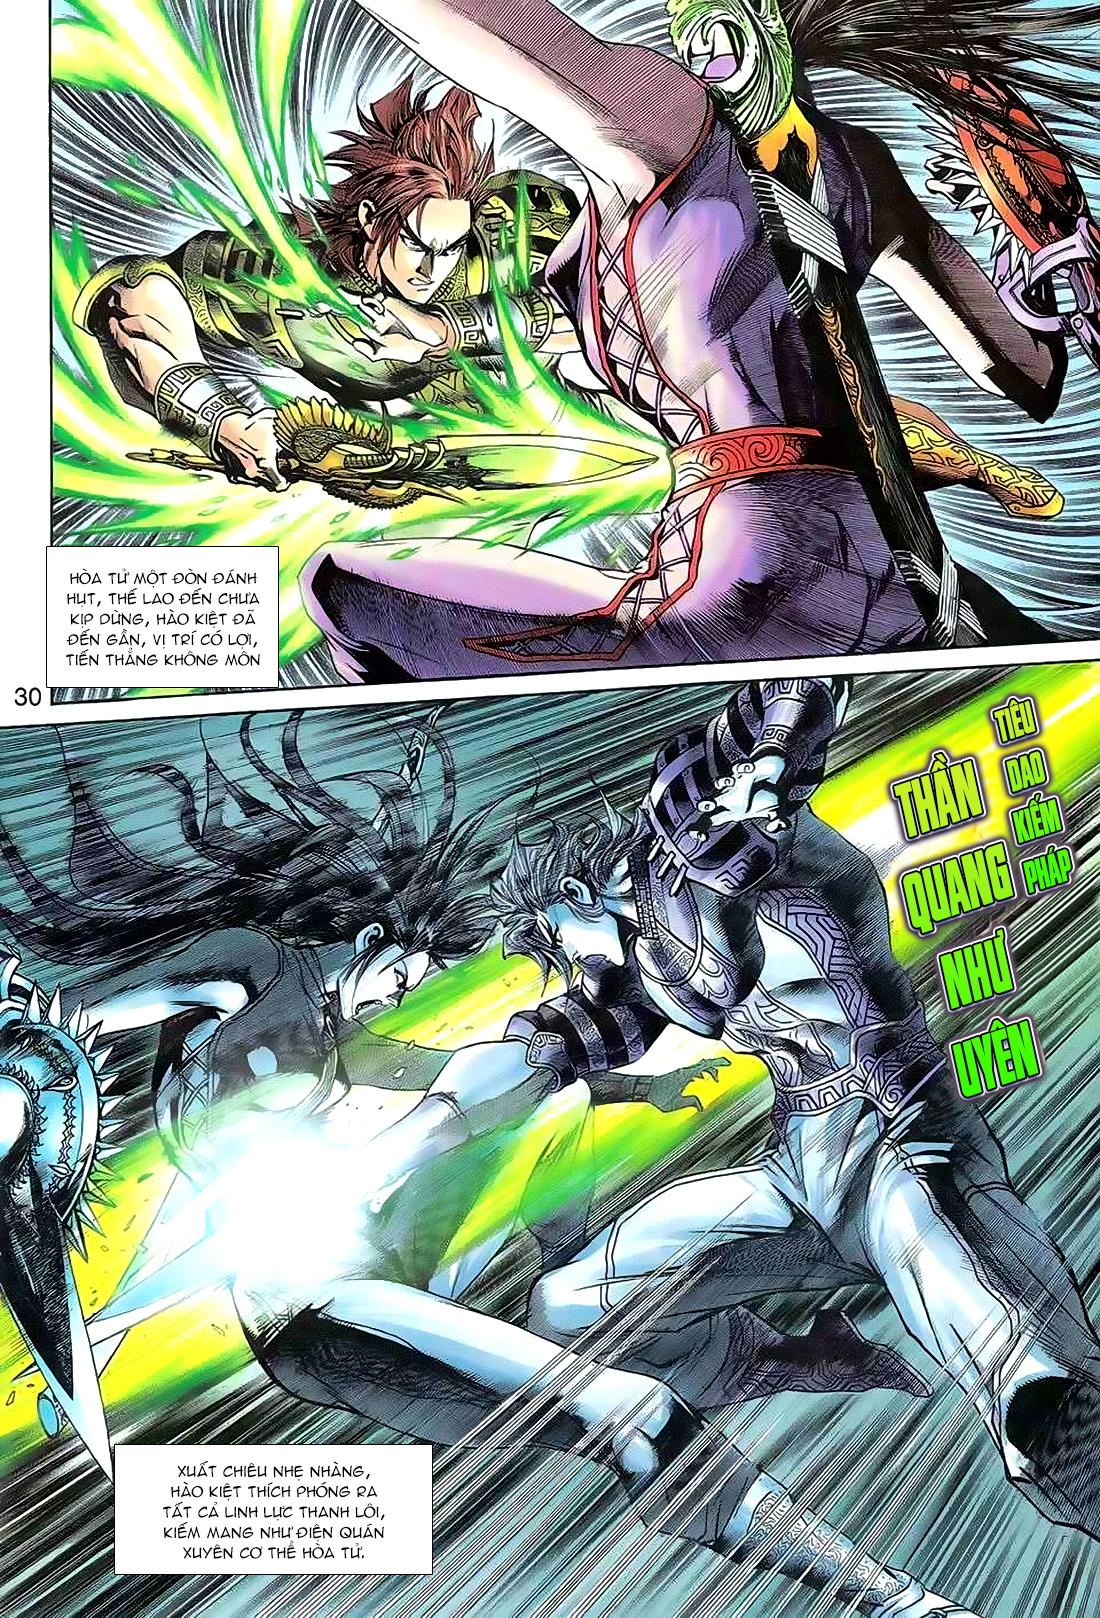 Thần binh huyền kỳ 3 - 3.5 Chapter 67 - Hamtruyen.vn